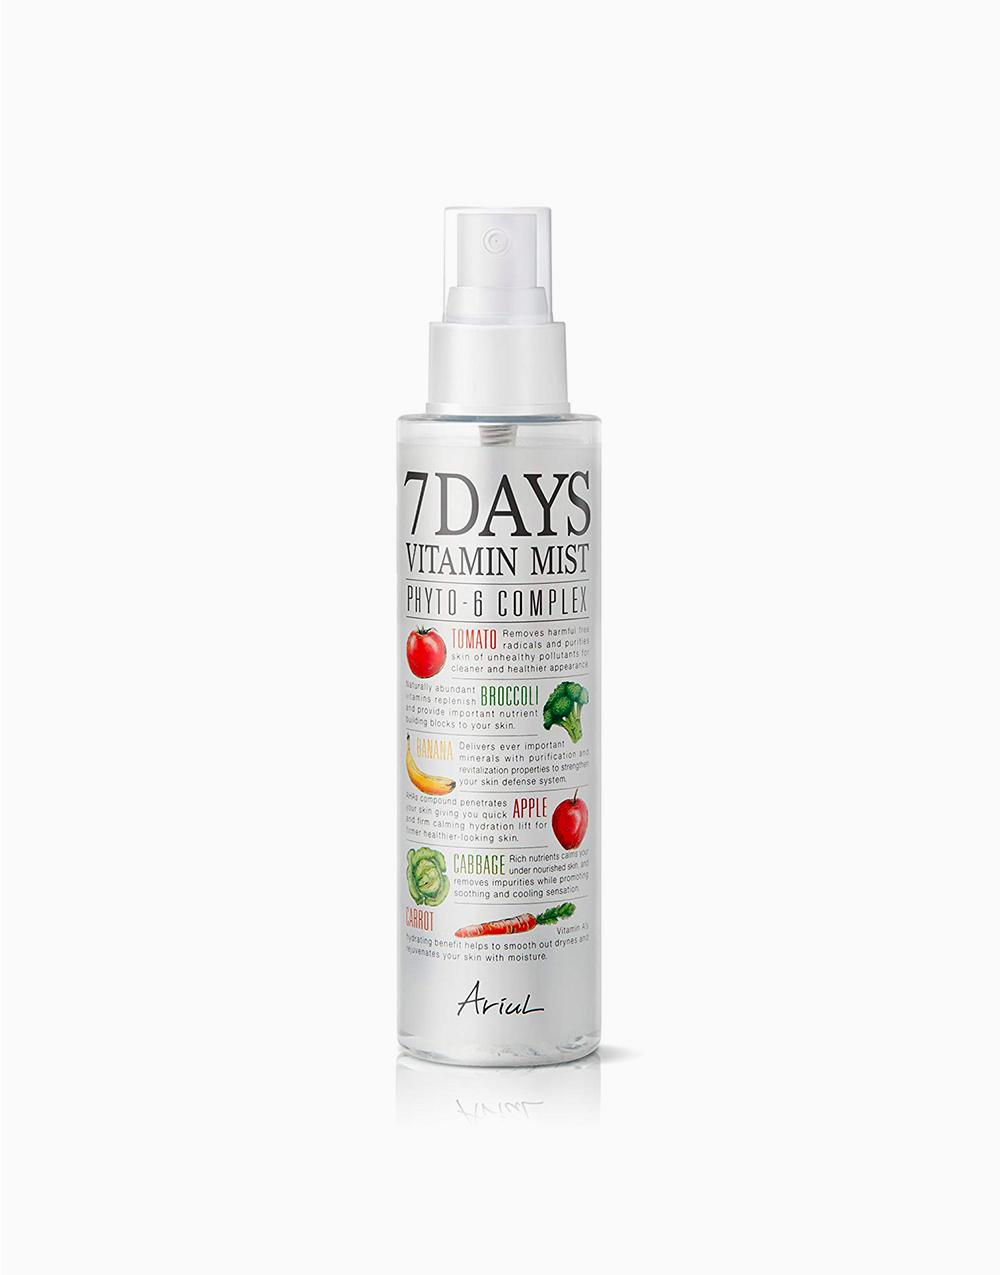 7days Vitamin Mist by Ariul